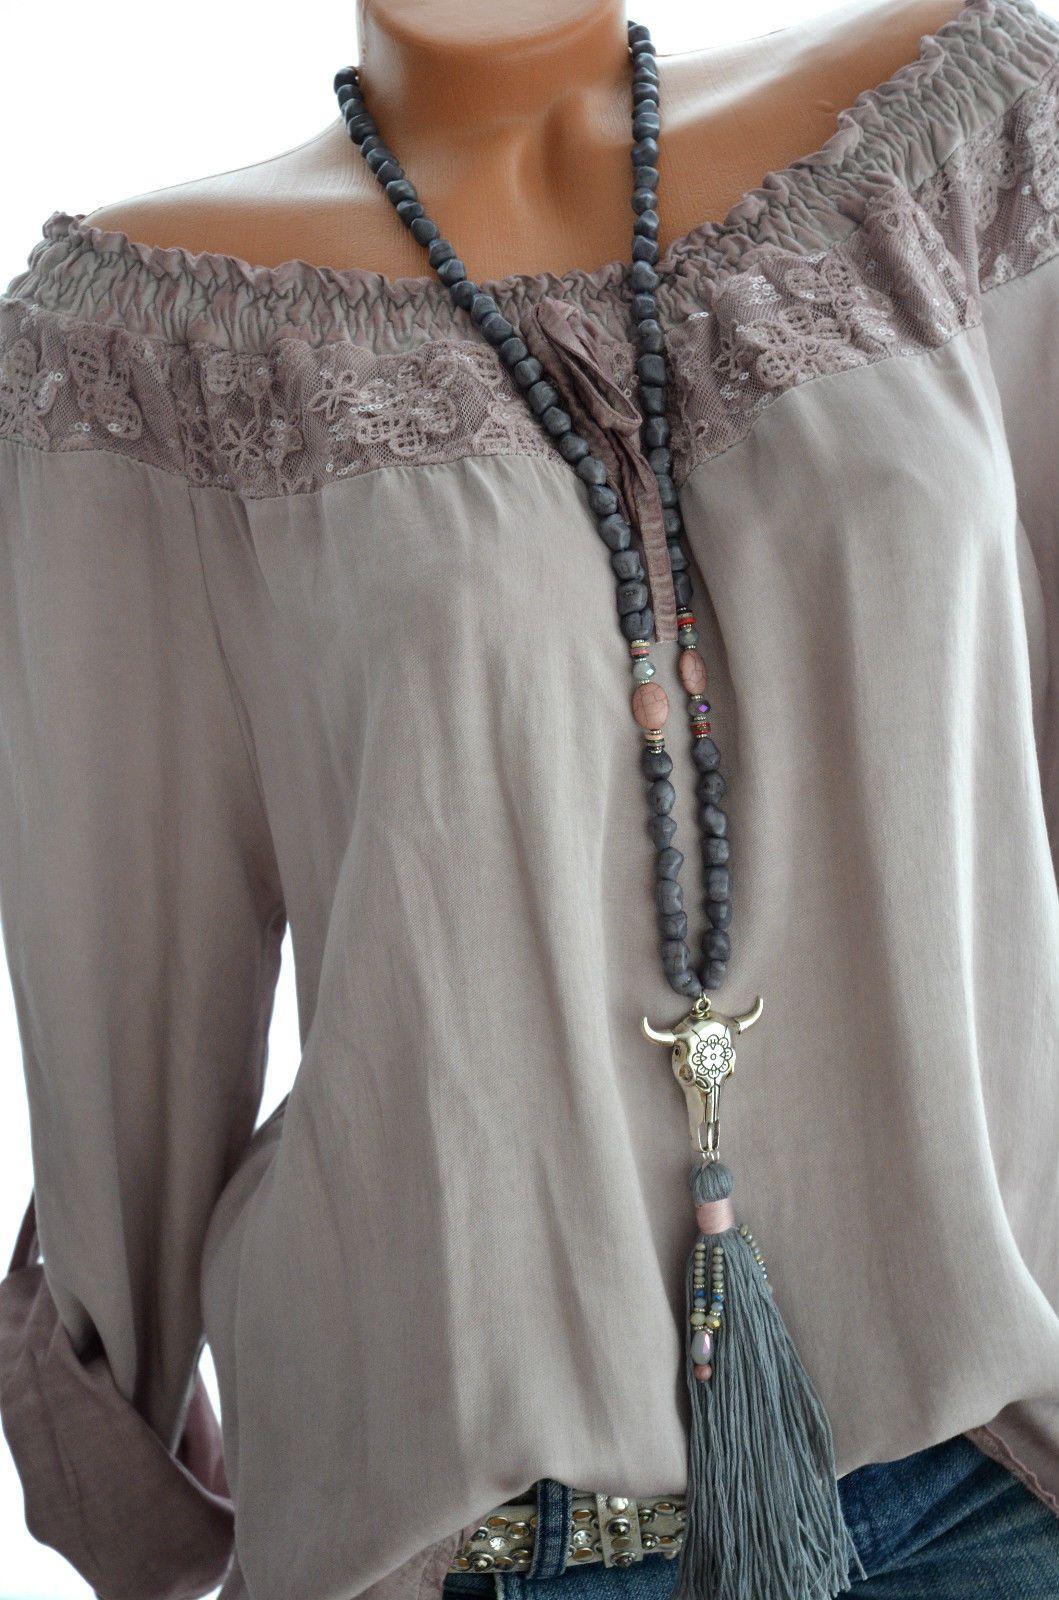 80e5926a5b3aa2 ITALY MODE Carmen Spitze BOHO Tunika Bluse Langarm 36 38 40 42 MAUVE Neu in  Kleidung   Accessoires